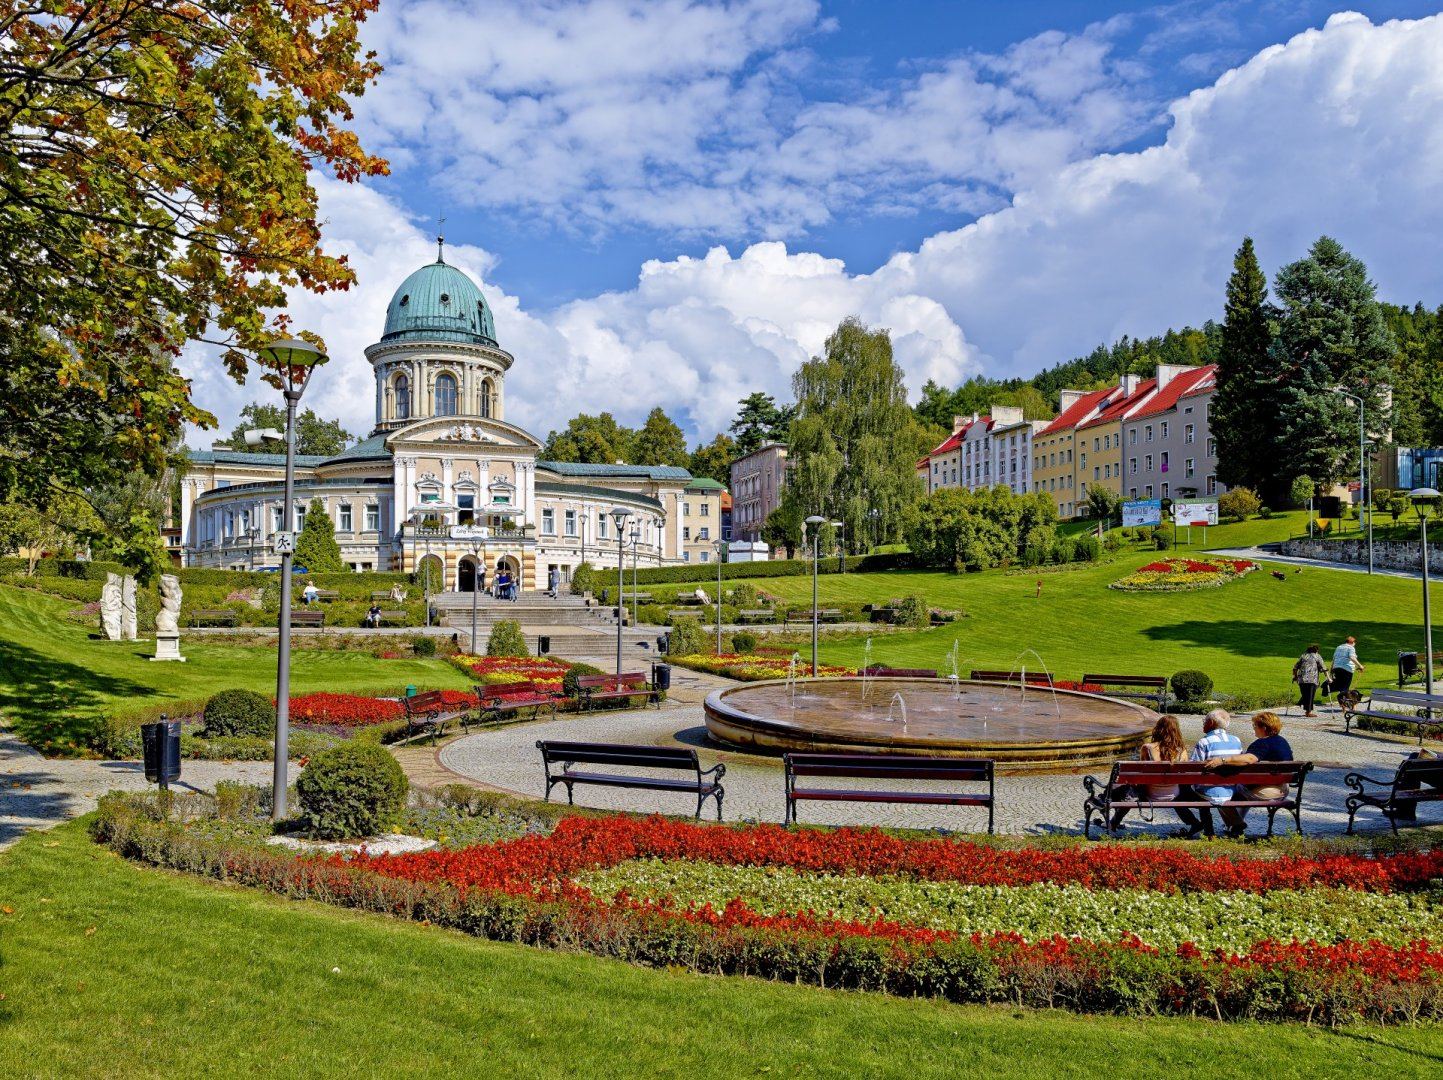 Attractions of Kotlina Kłodzka